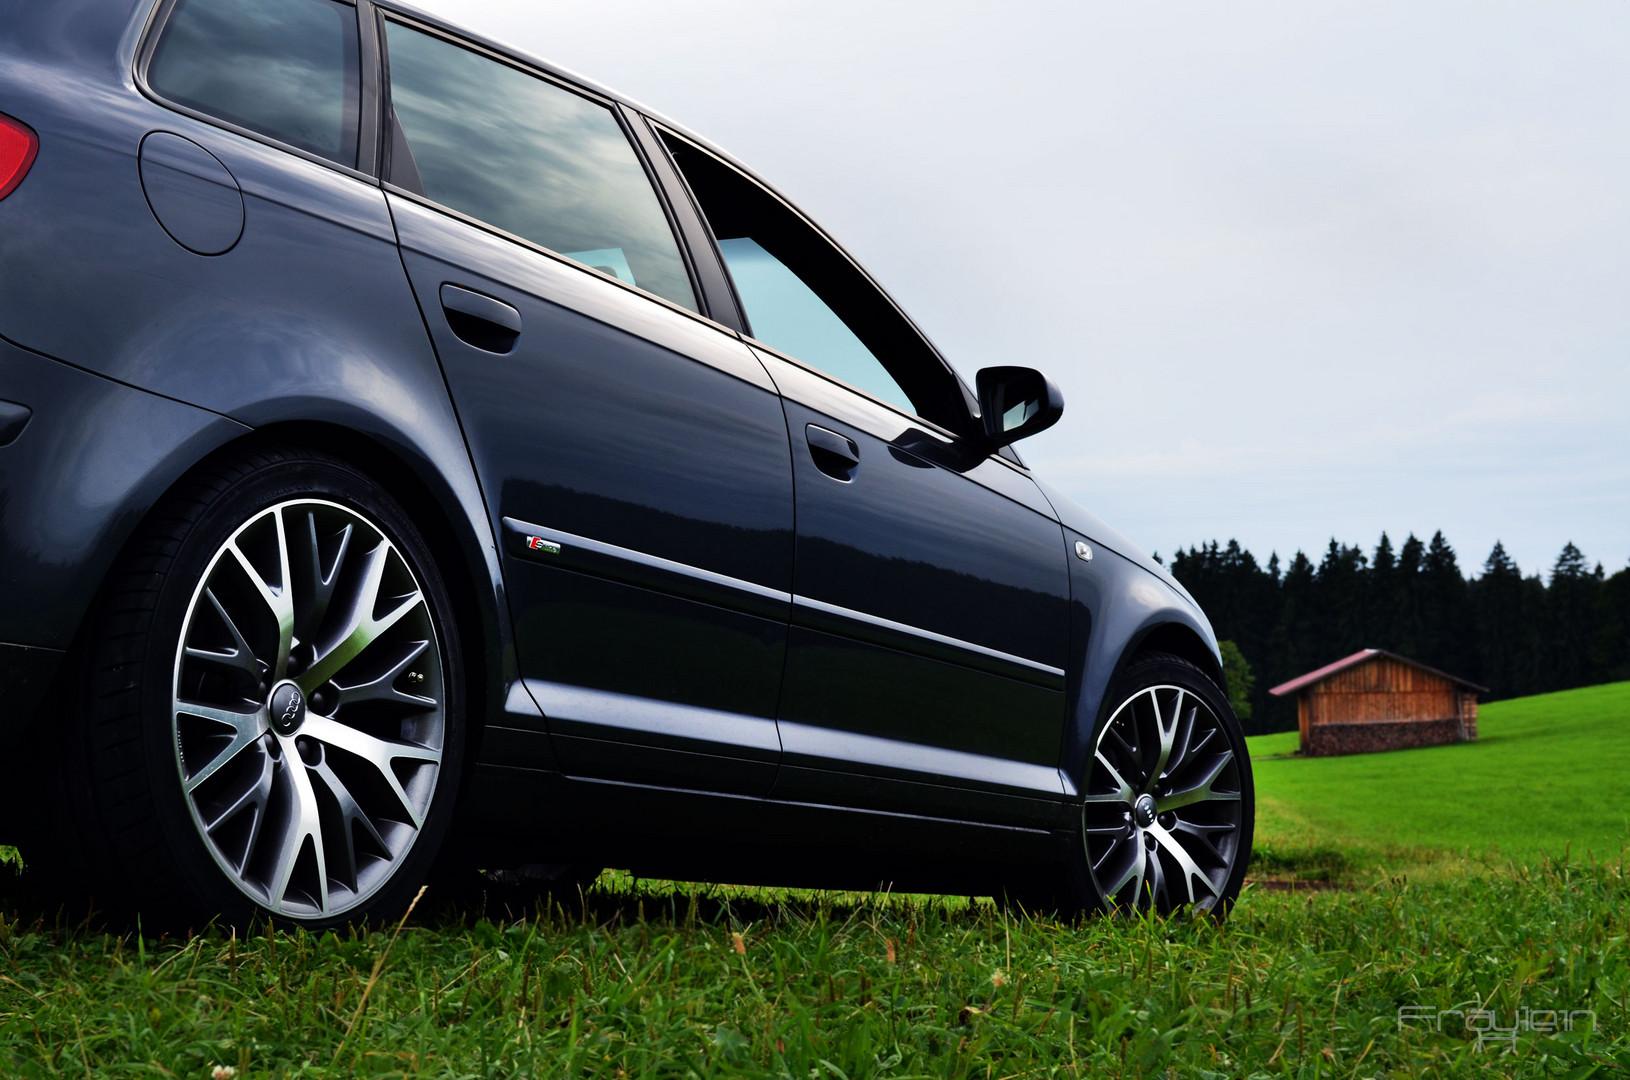 Audi A3 Sommer 2k12